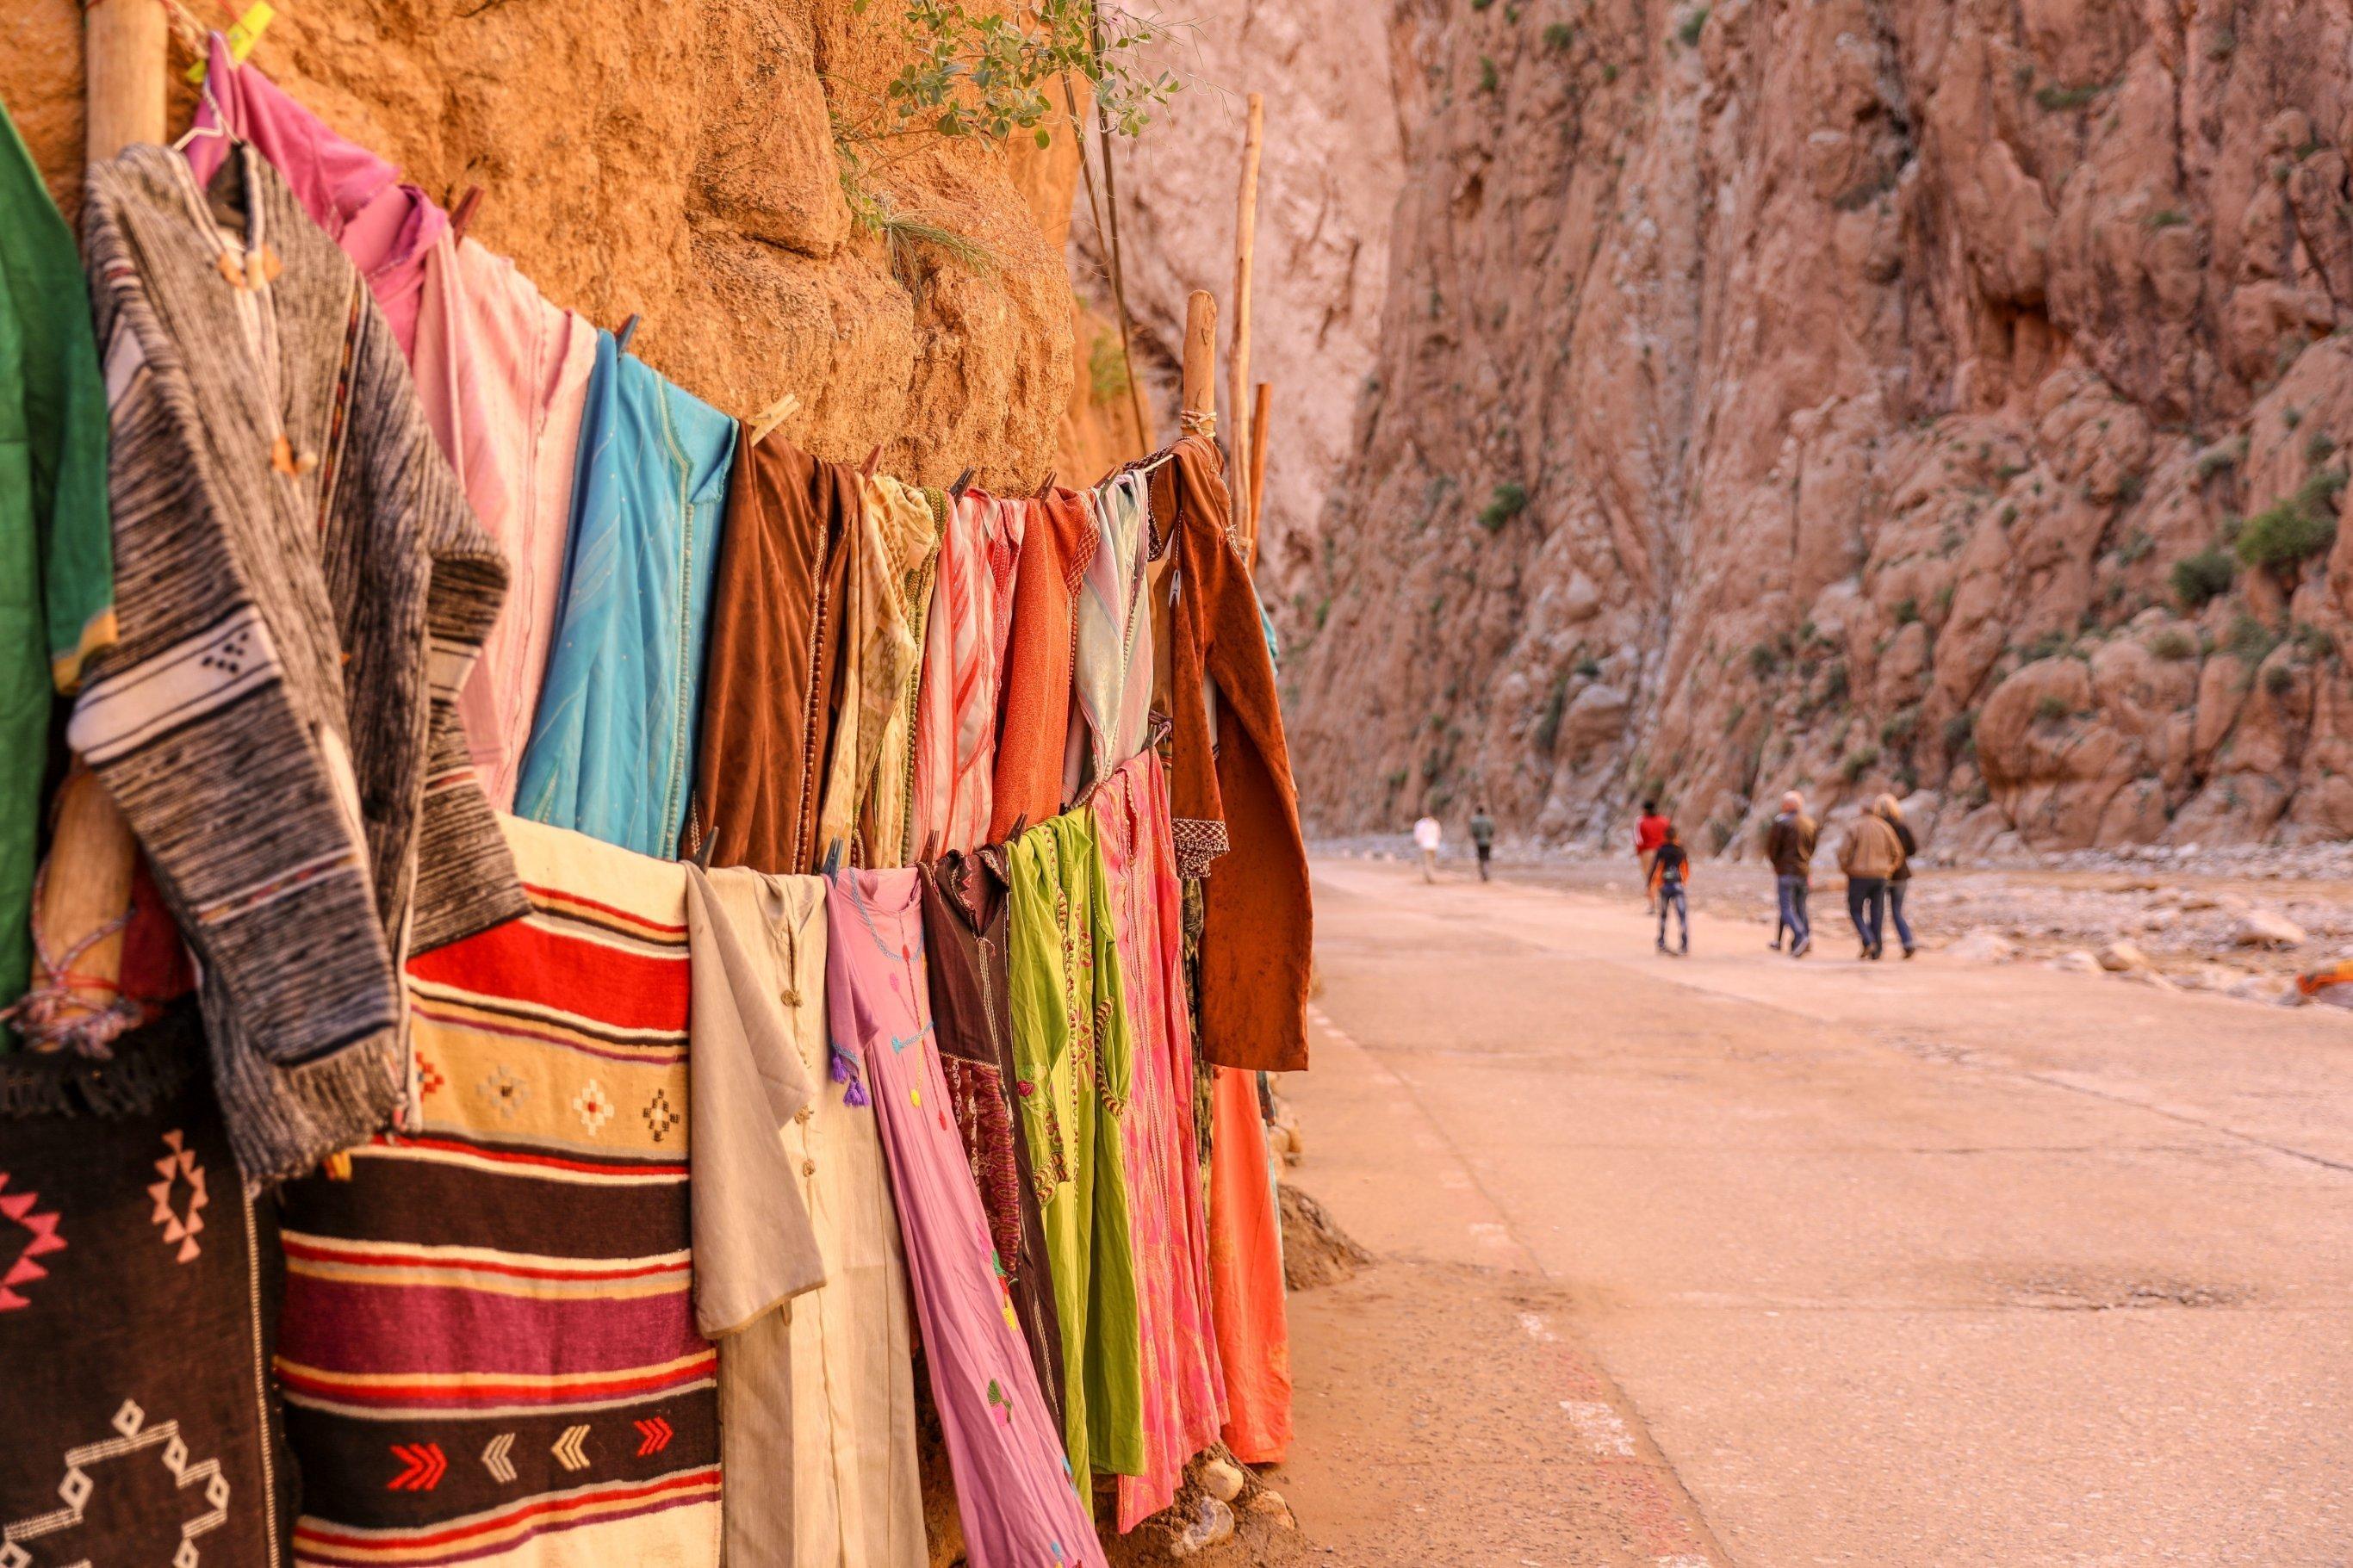 3-Day Merzouga Desert & Dades Valley - Morocco Itinerary